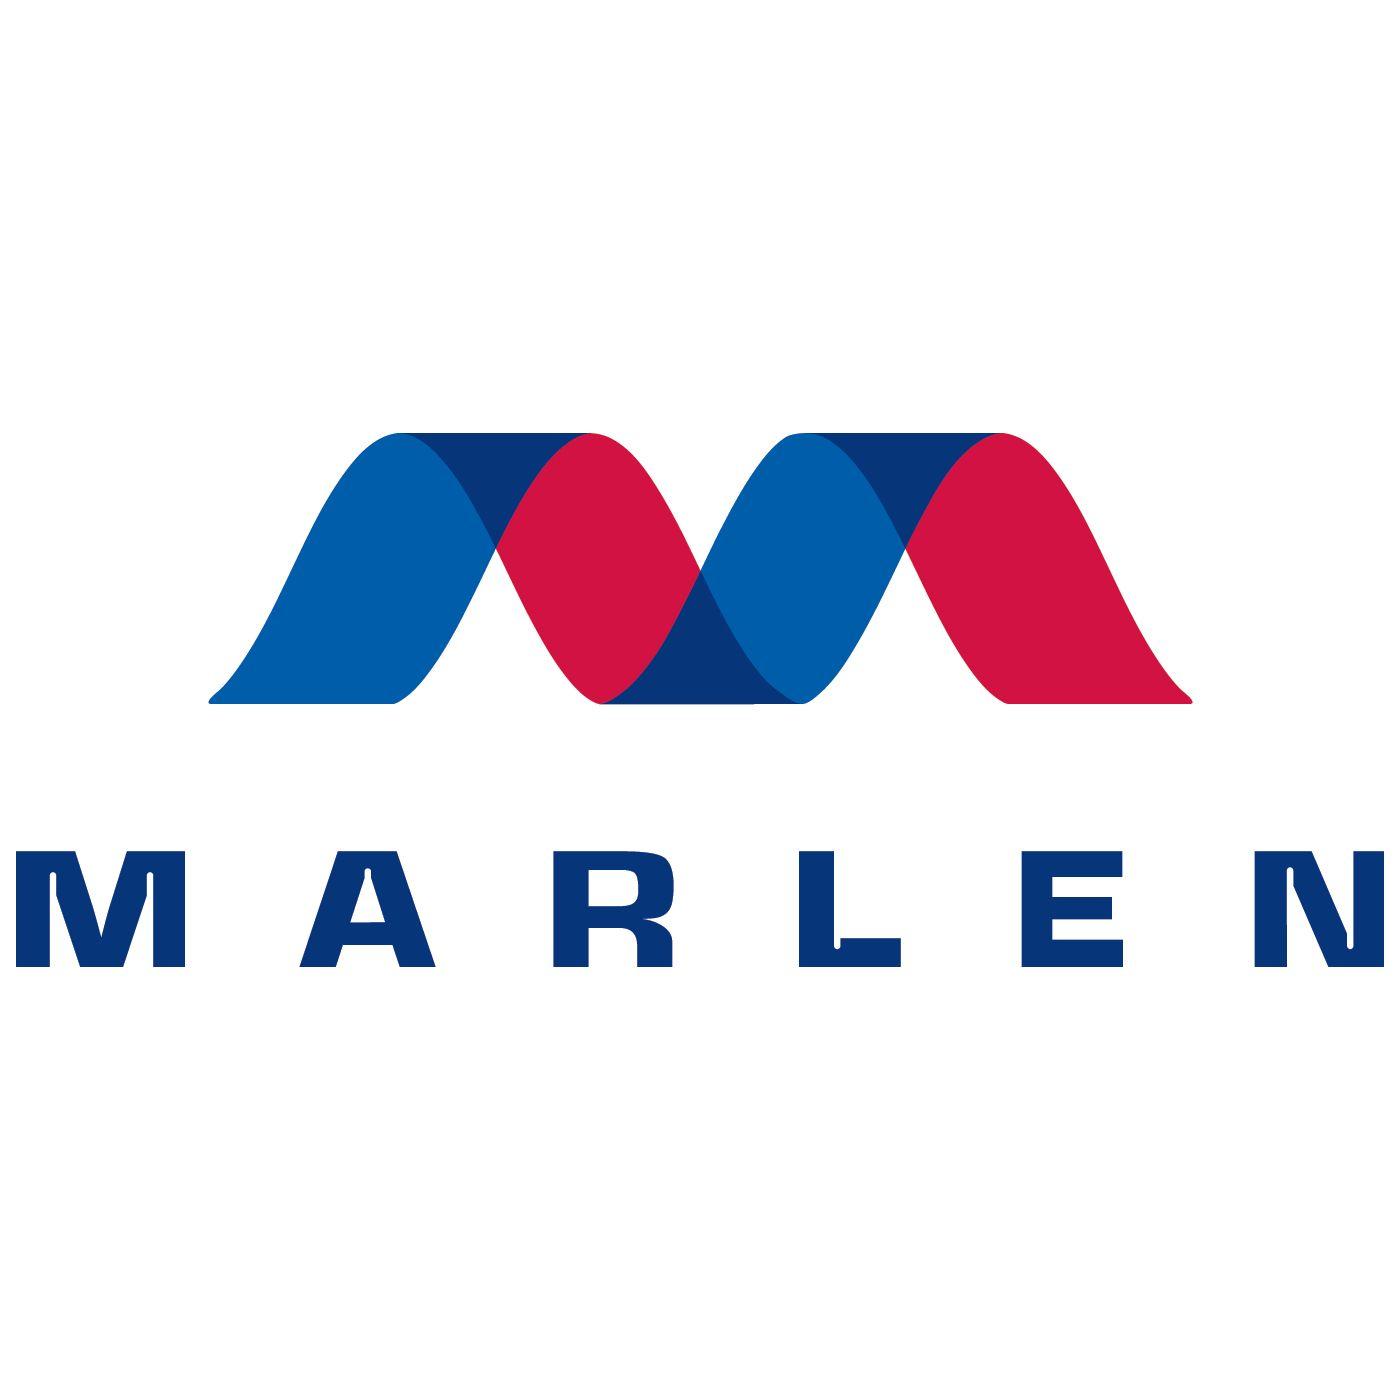 gardner design marlen food processing equipment logo design a rh pinterest com